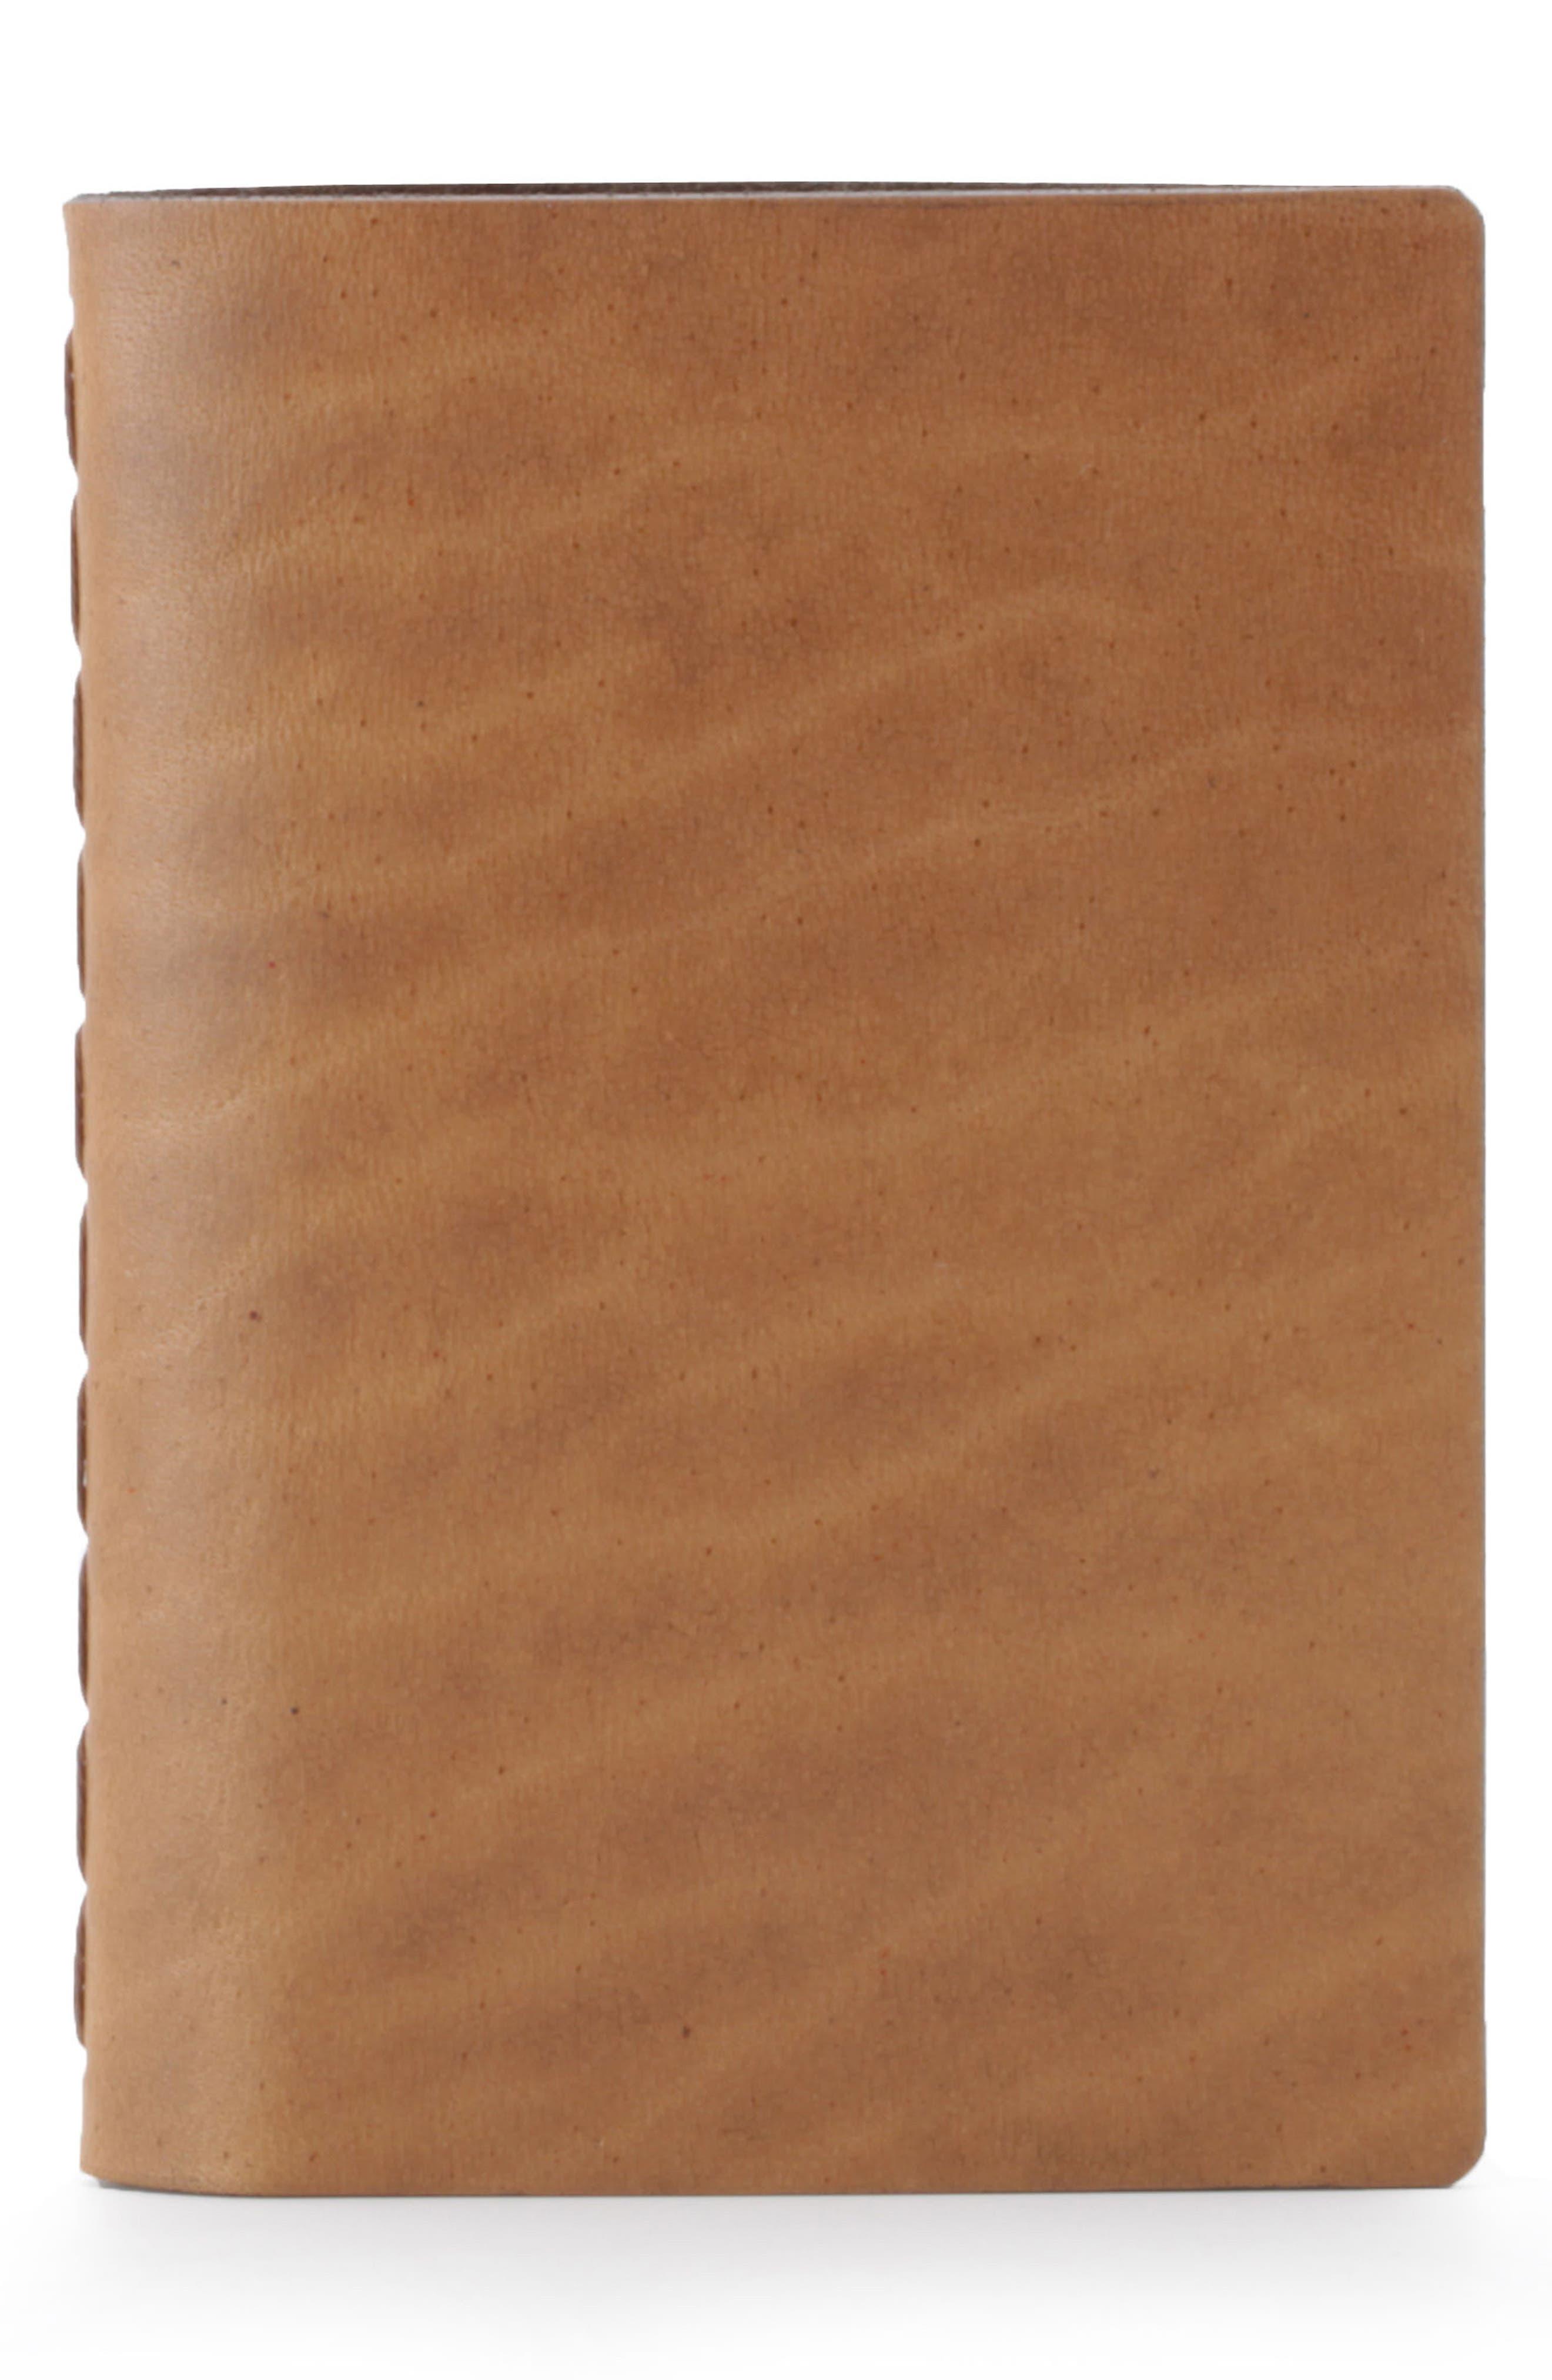 Ezra Arthur Small Leather Notebook